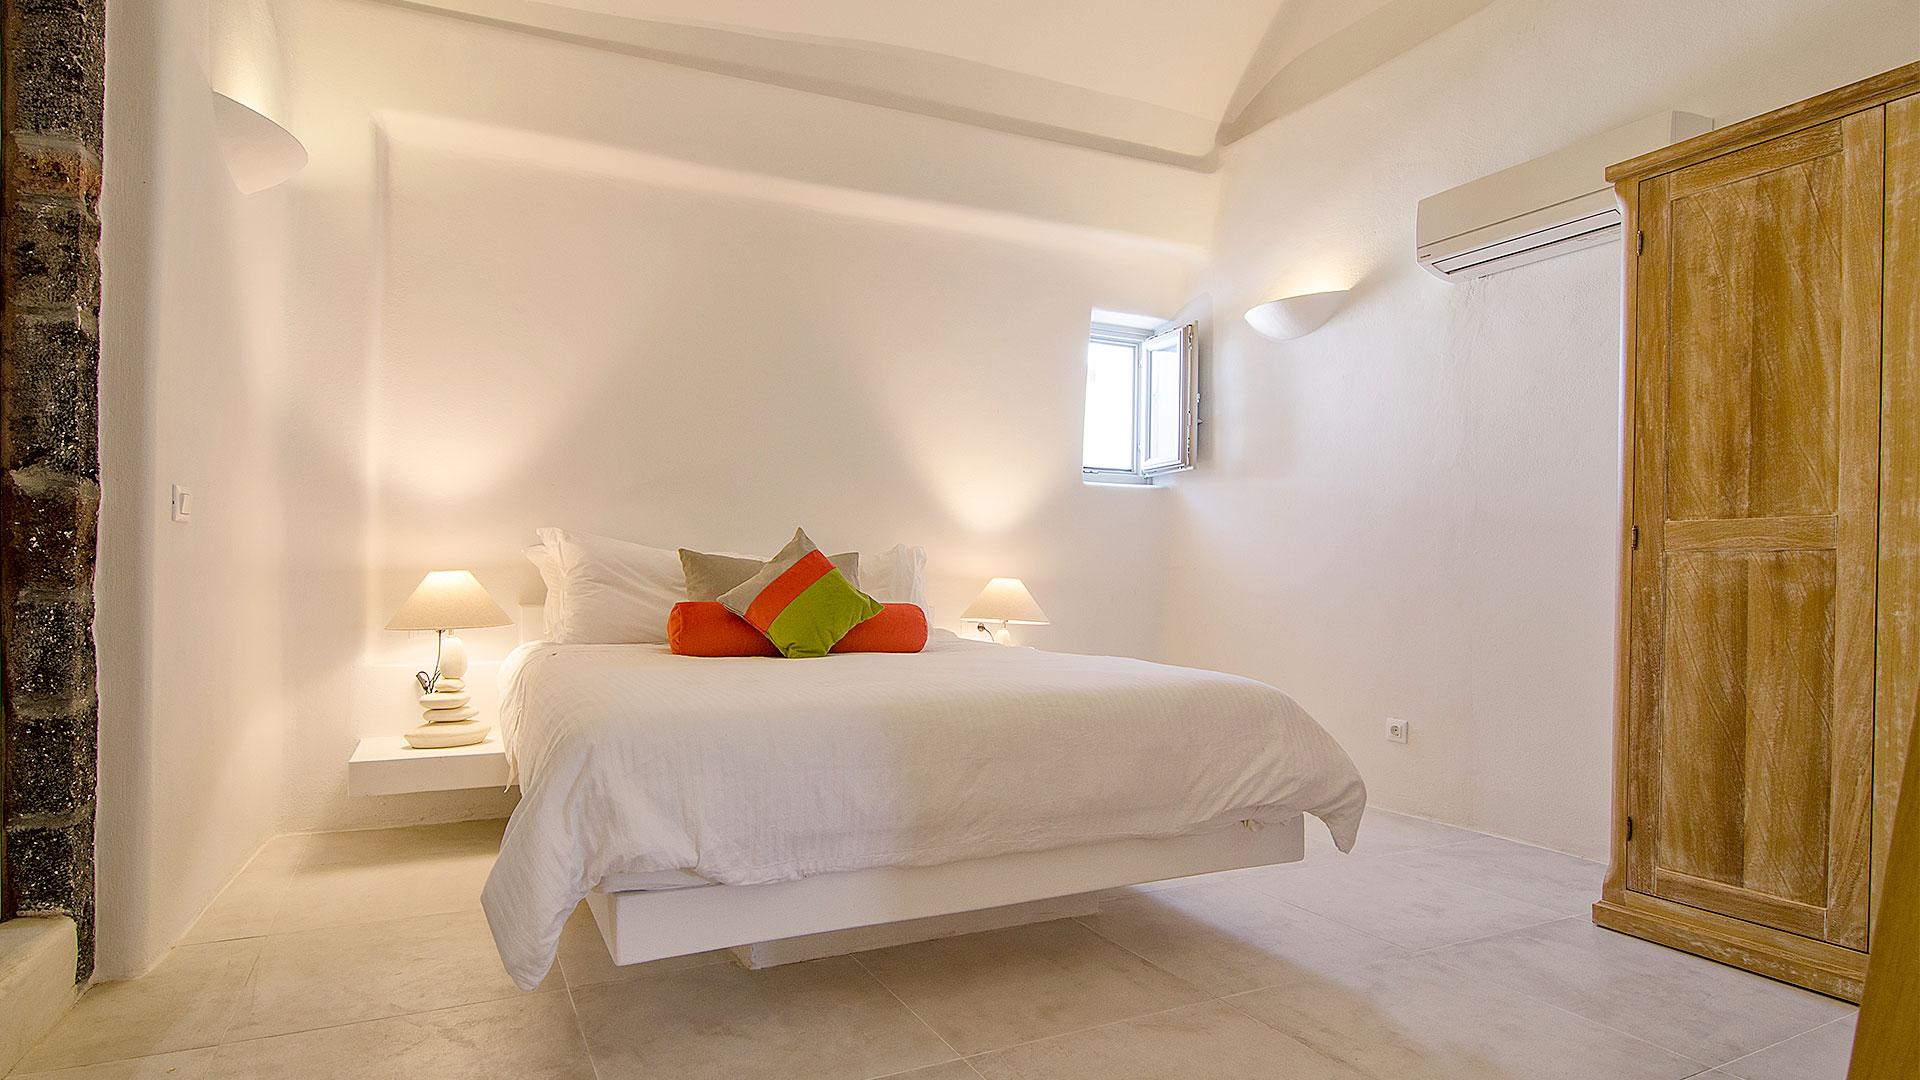 Santorini jacuzzi suites   Pura Vida   Bedroom